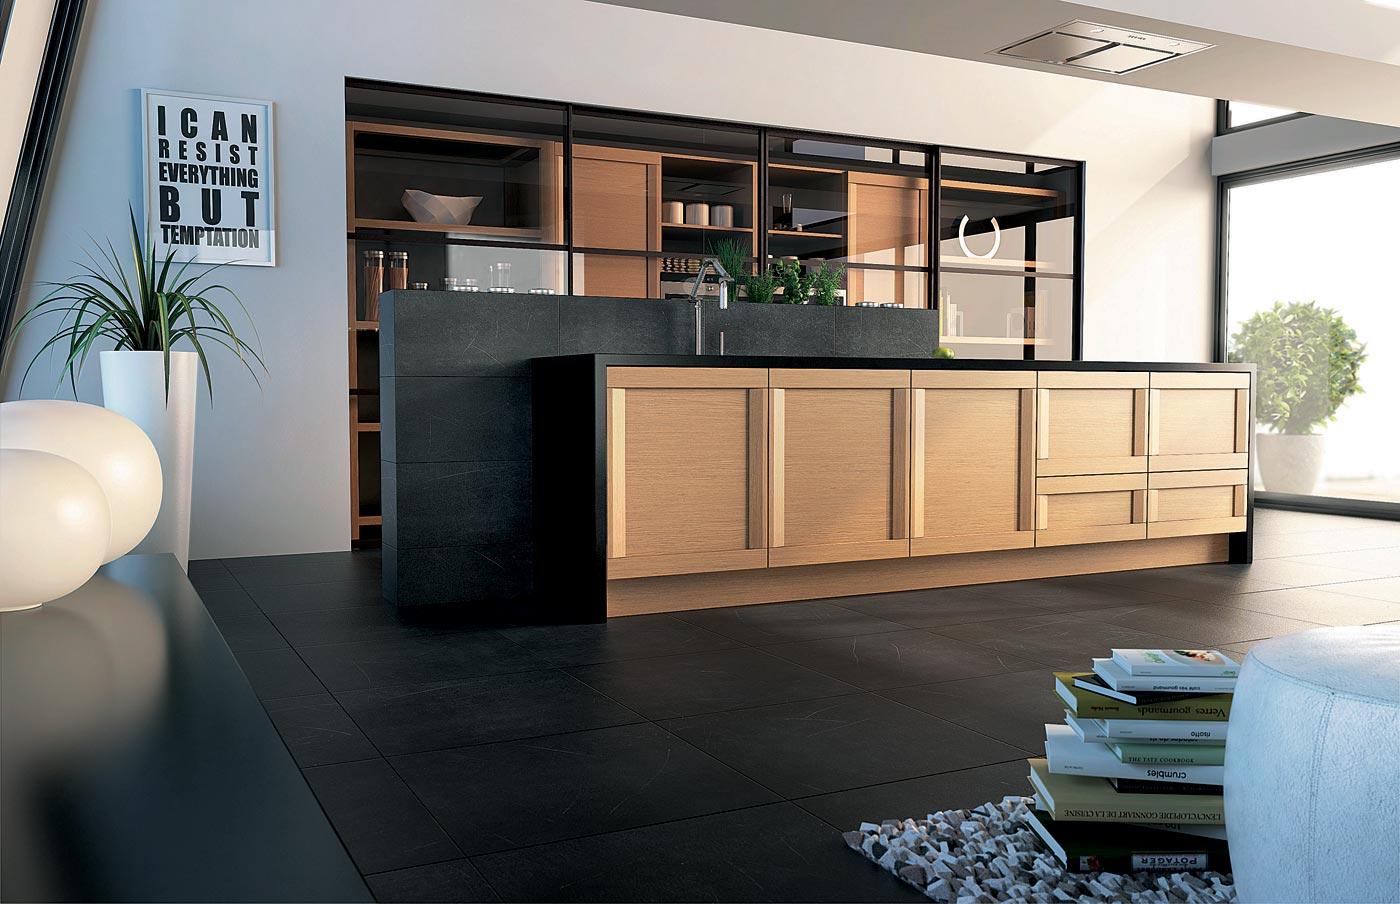 cuisine esquisse ch ne nature perene lyon. Black Bedroom Furniture Sets. Home Design Ideas